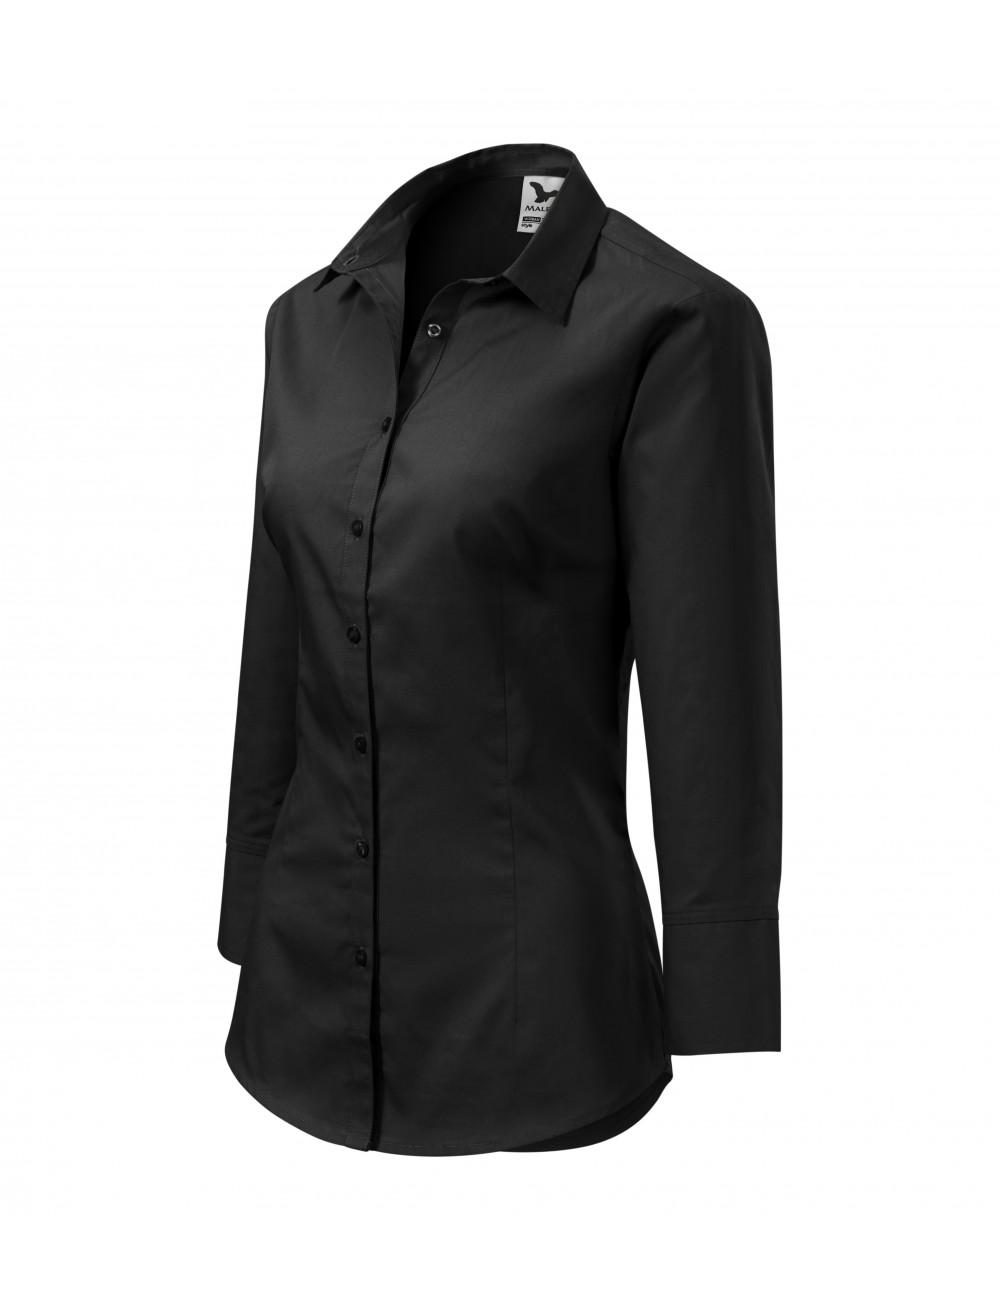 Adler MALFINI Koszula damska Style 218 czarny